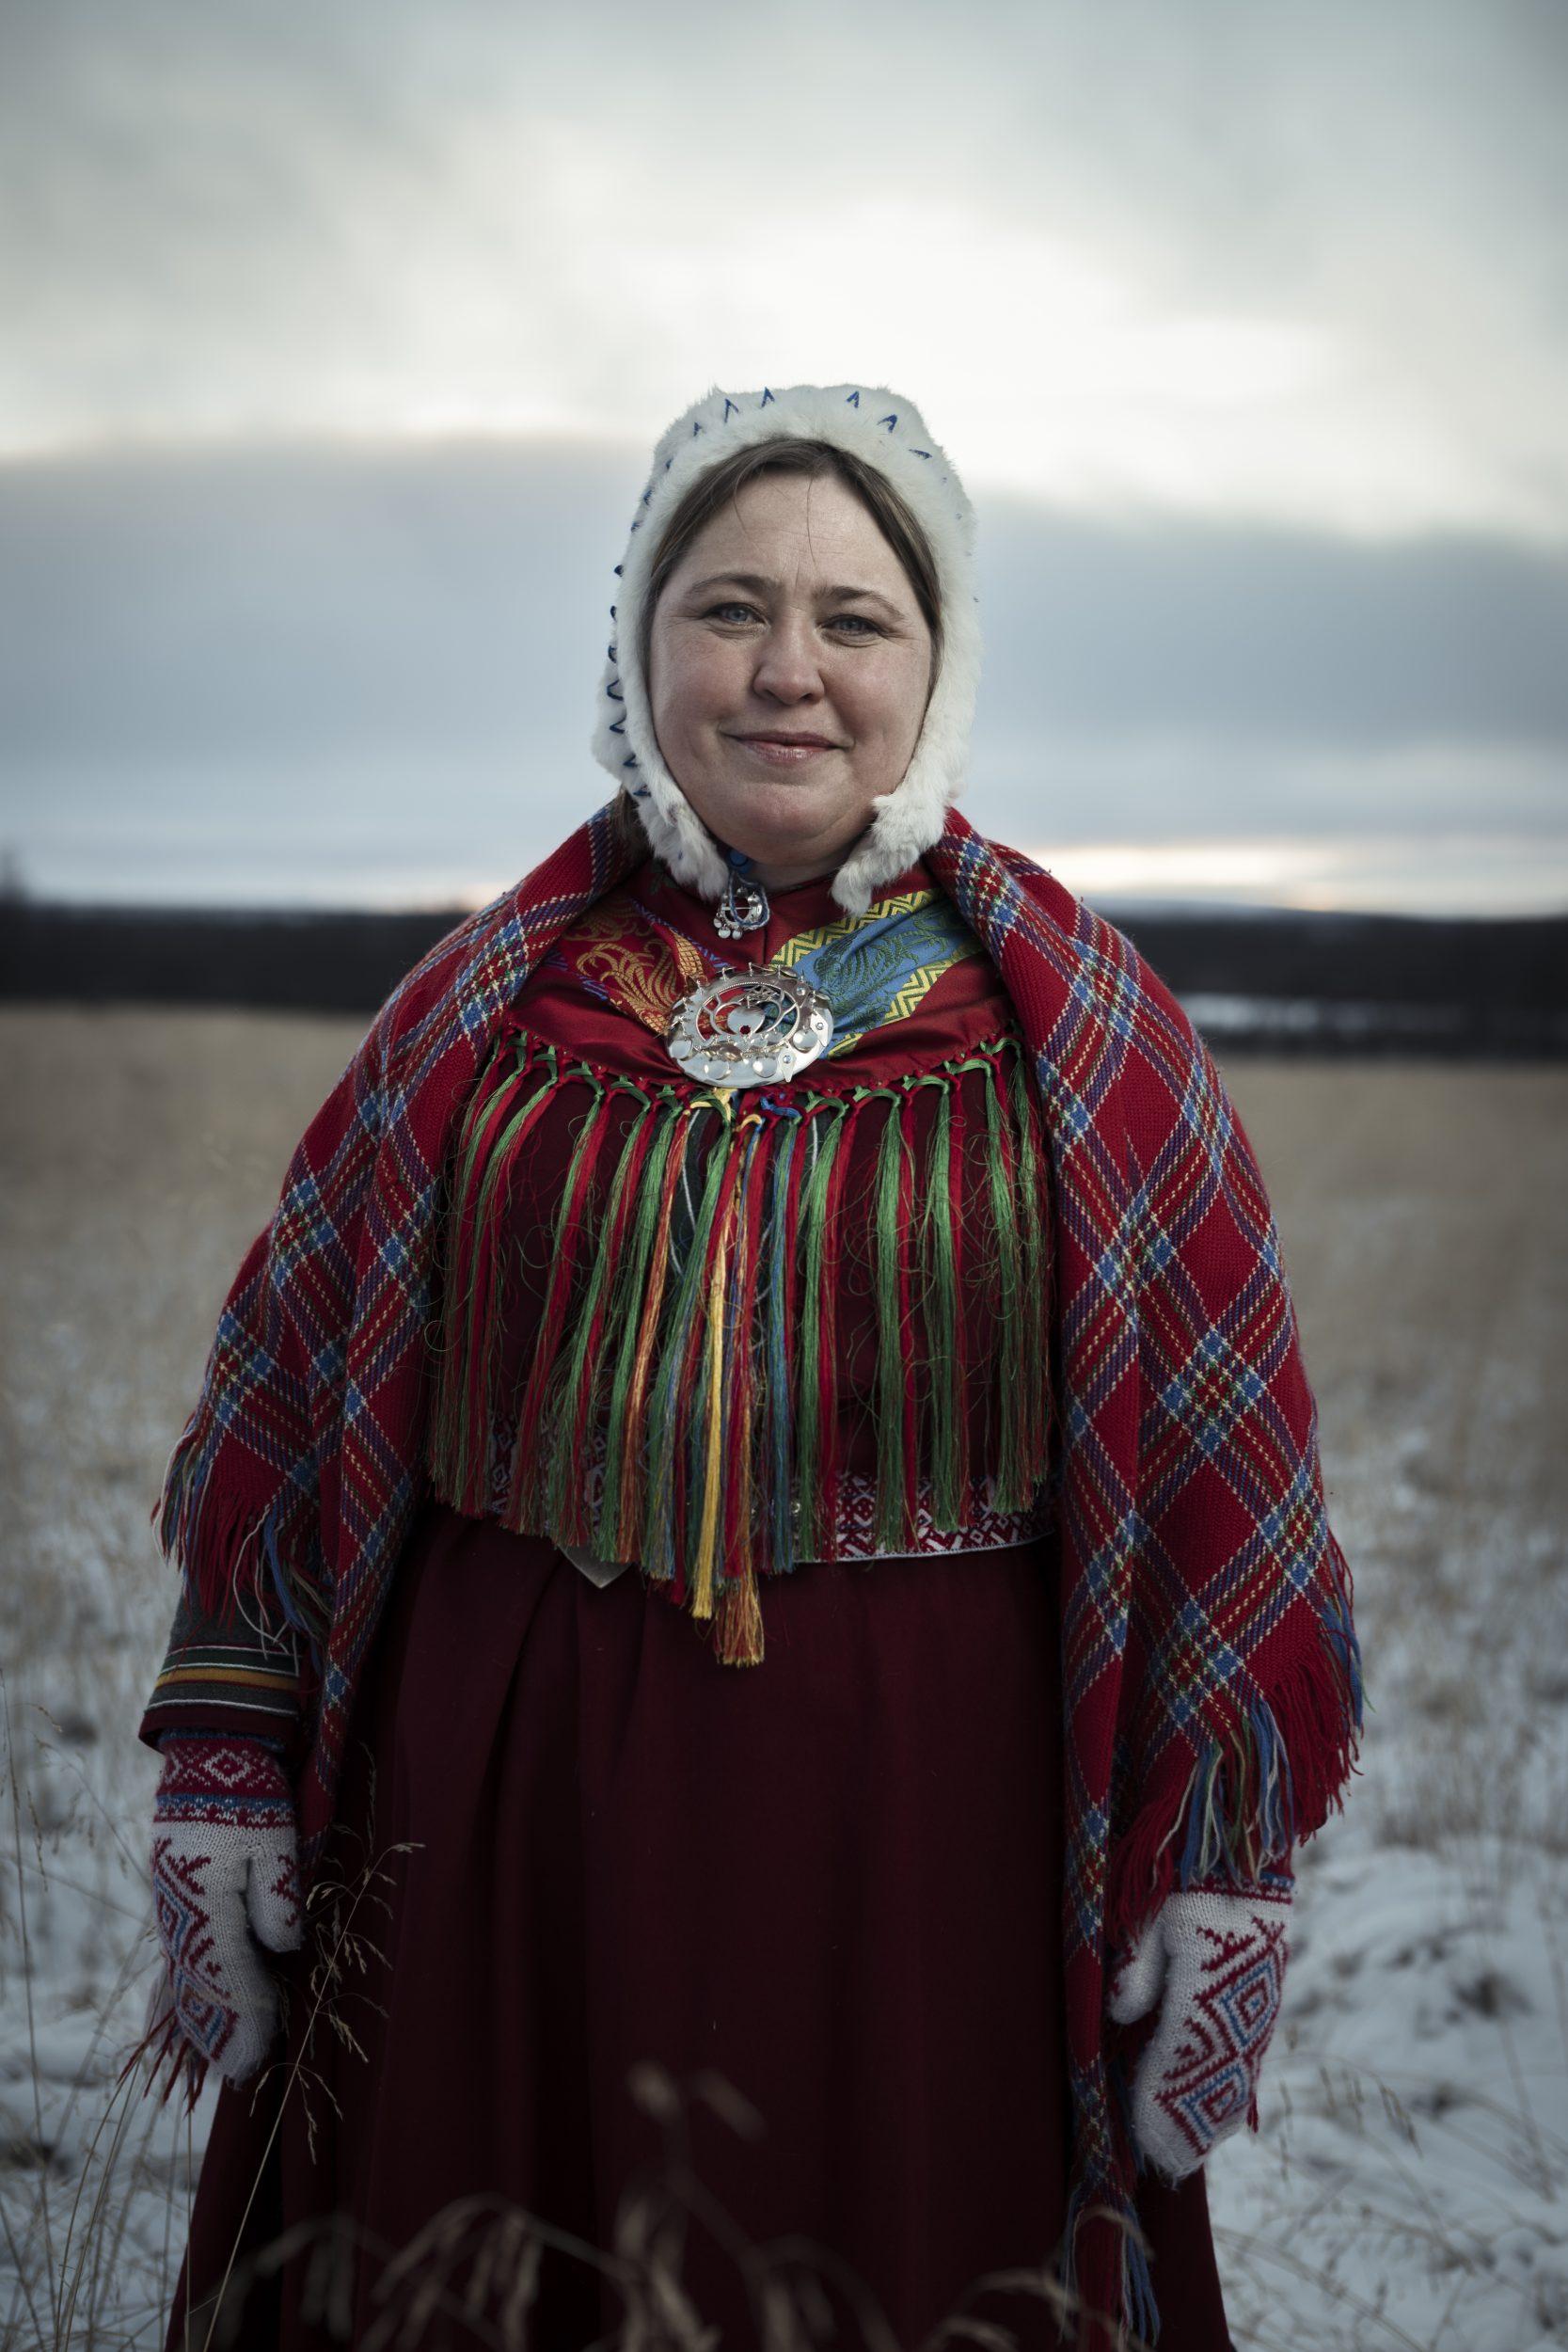 sami norway norwegian saami culture finnish lapps jarle cultural leica hagen camera exploring traditions anthroscape